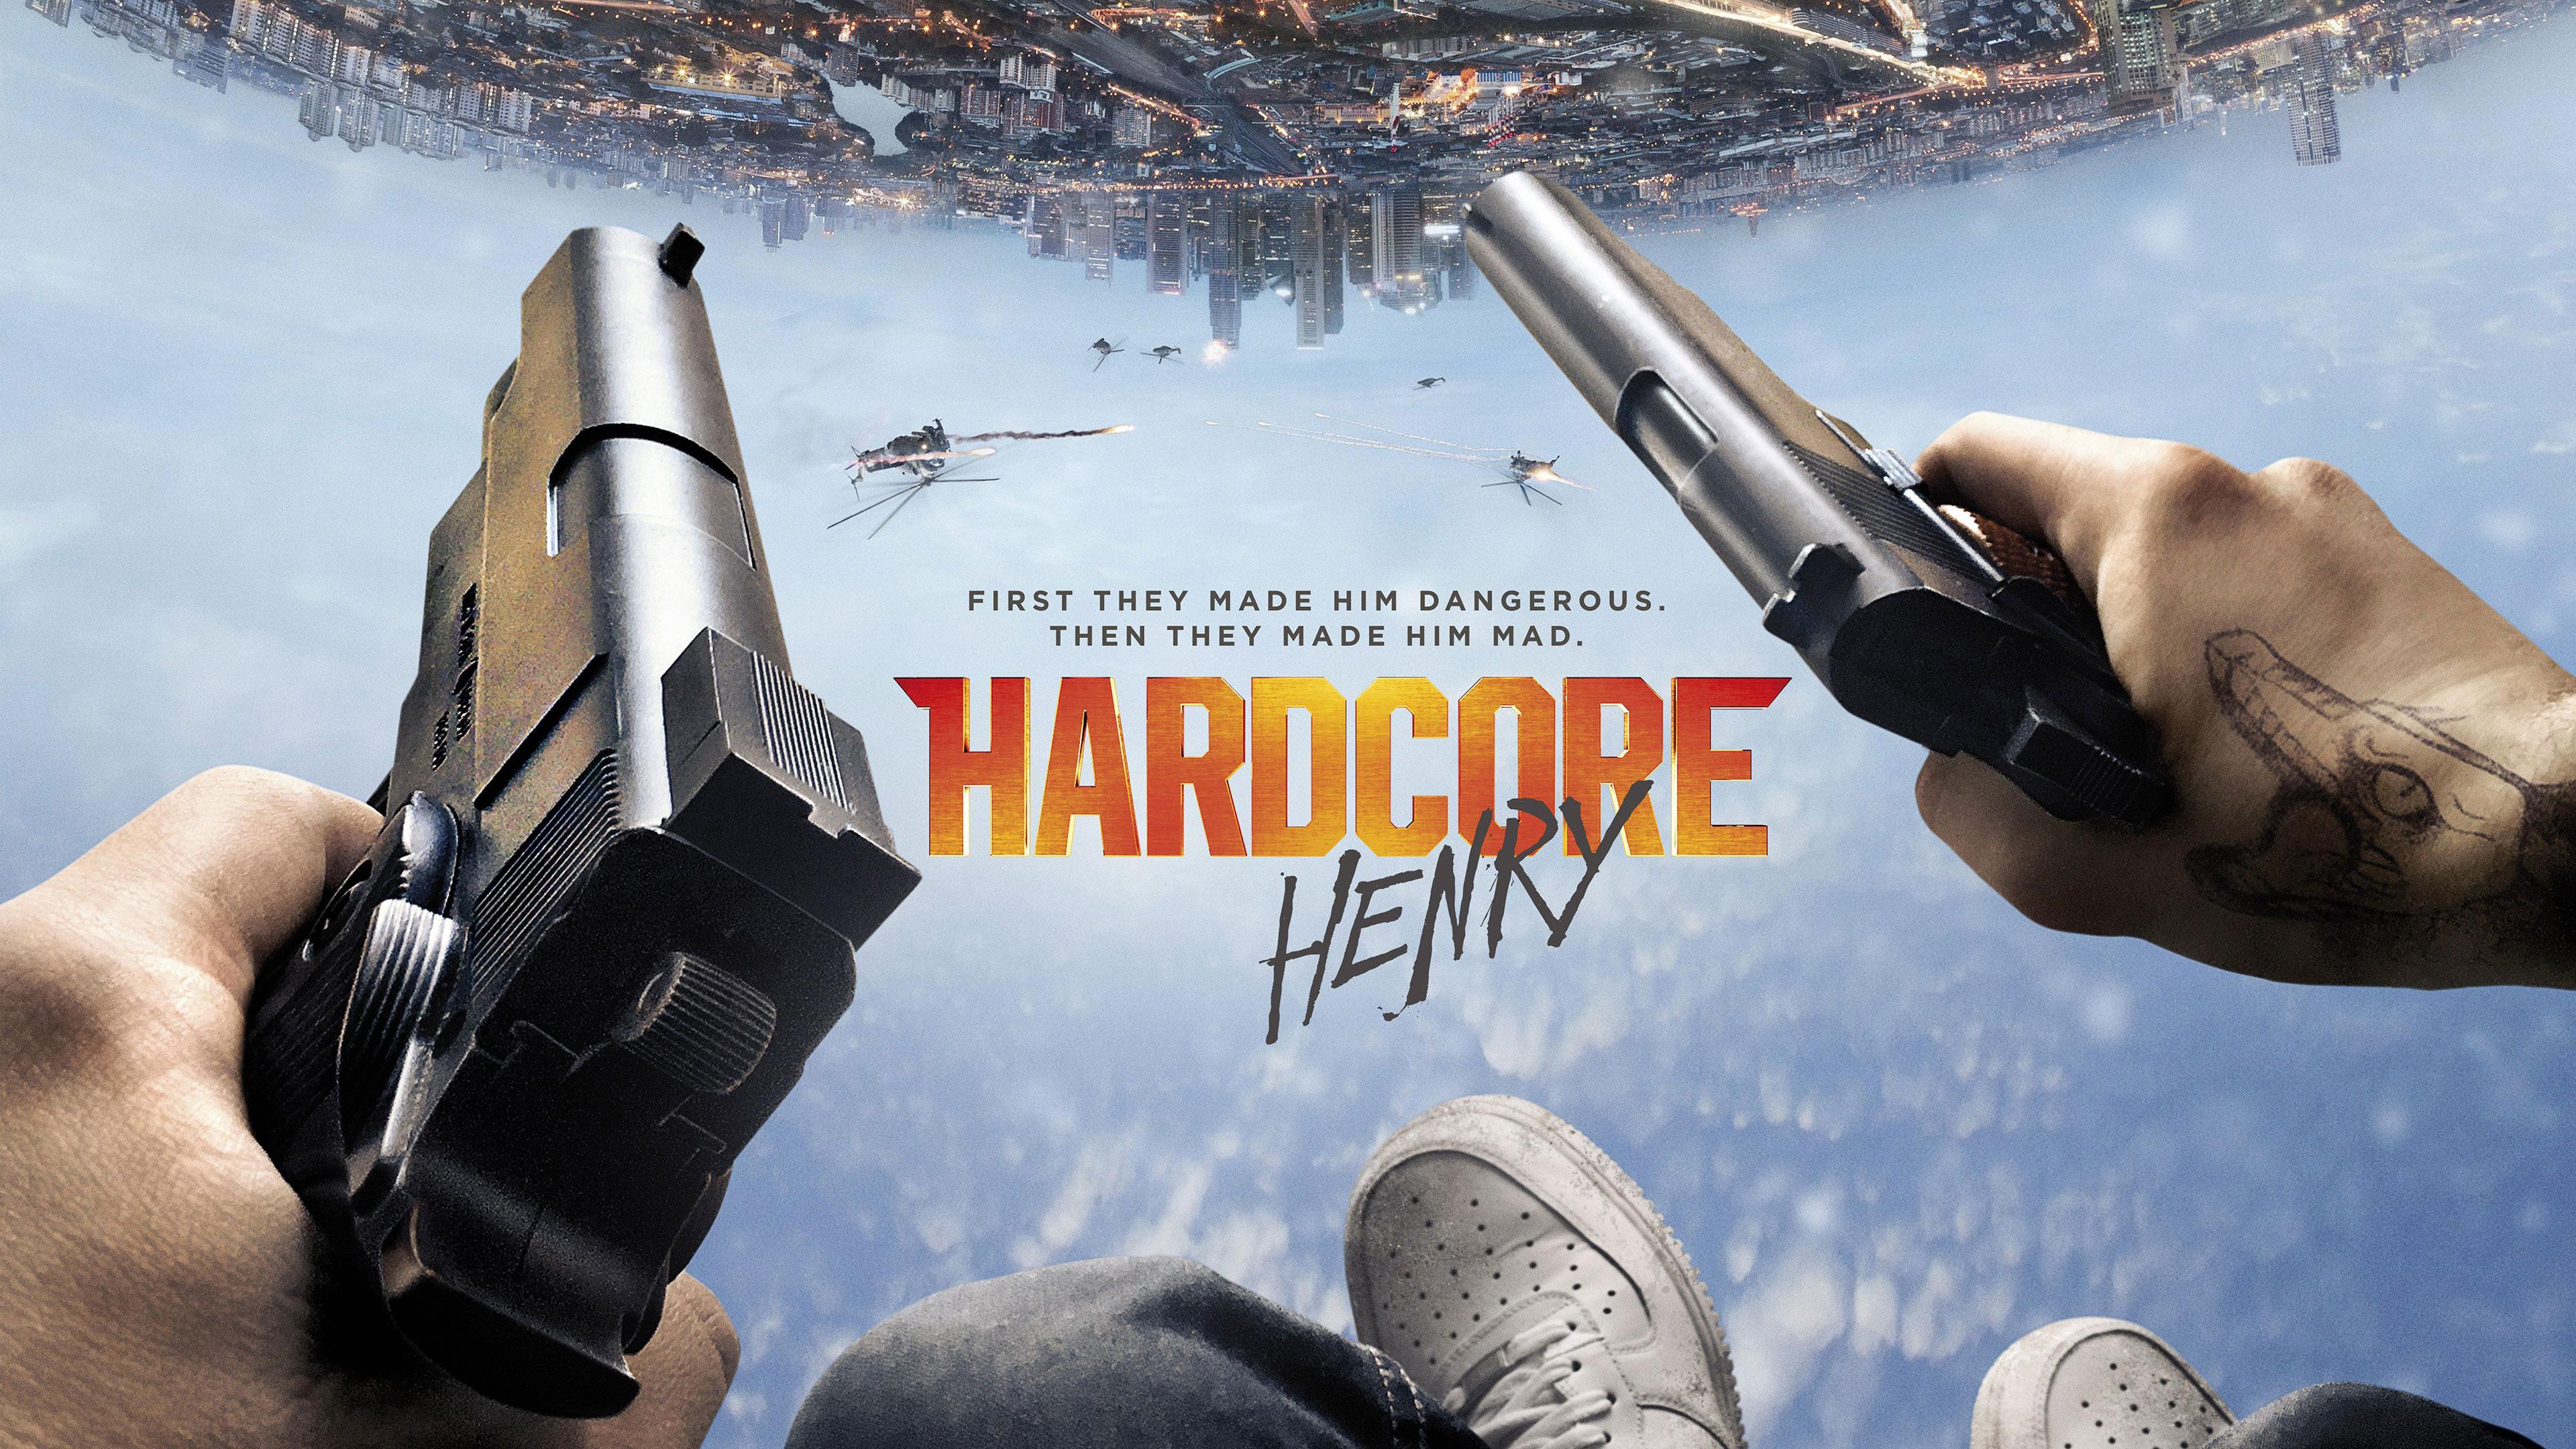 Хардкор Генри. обои скачать